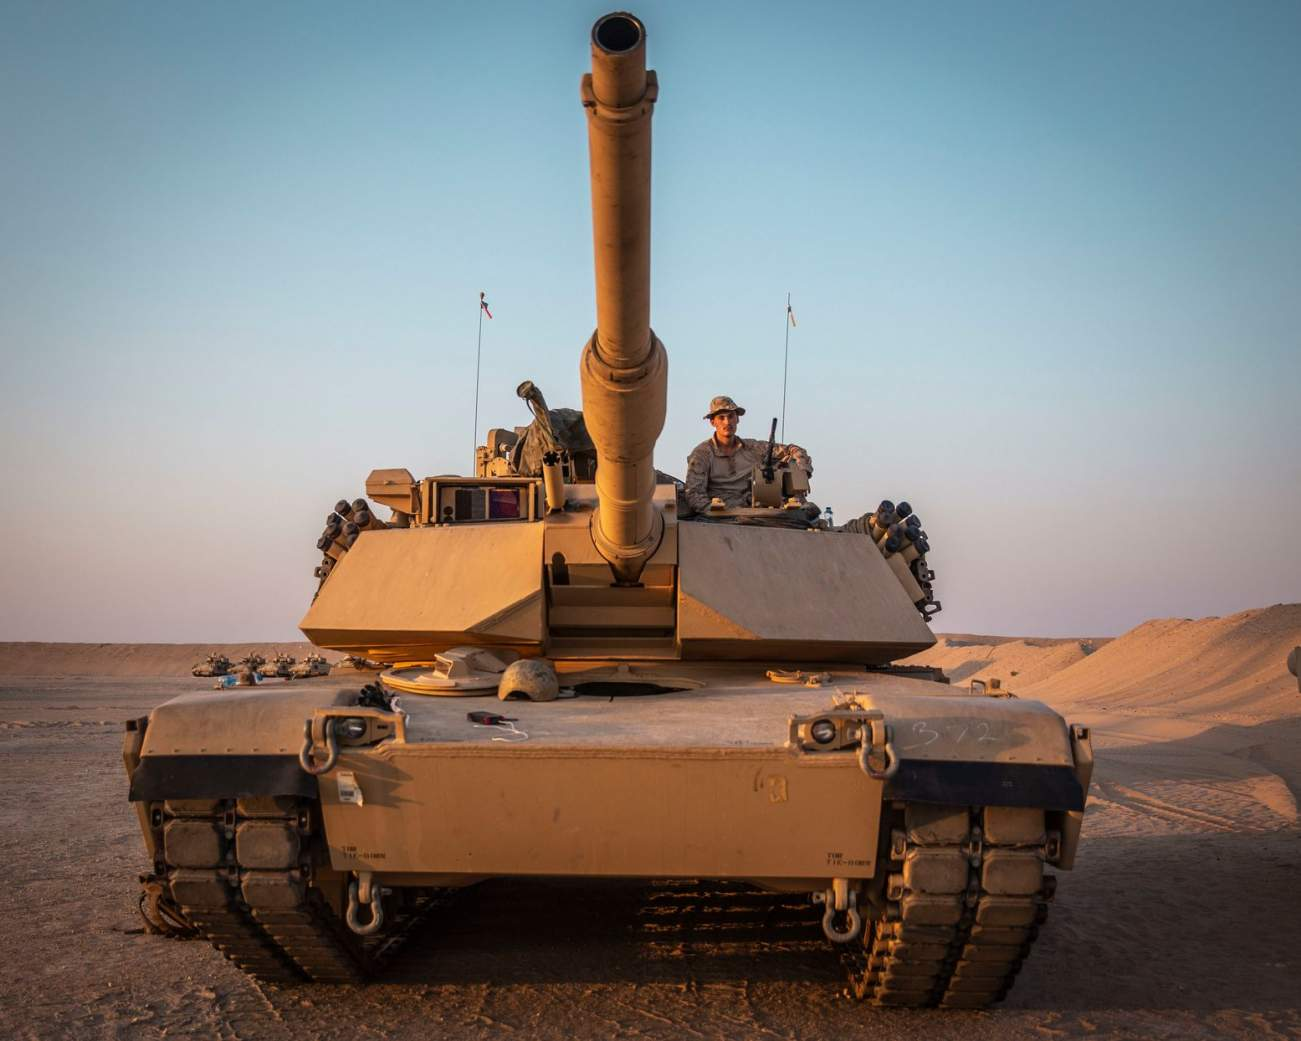 https://www.dvidshub.net/image/5784140/11th-meu-tanks-shoot-table-5